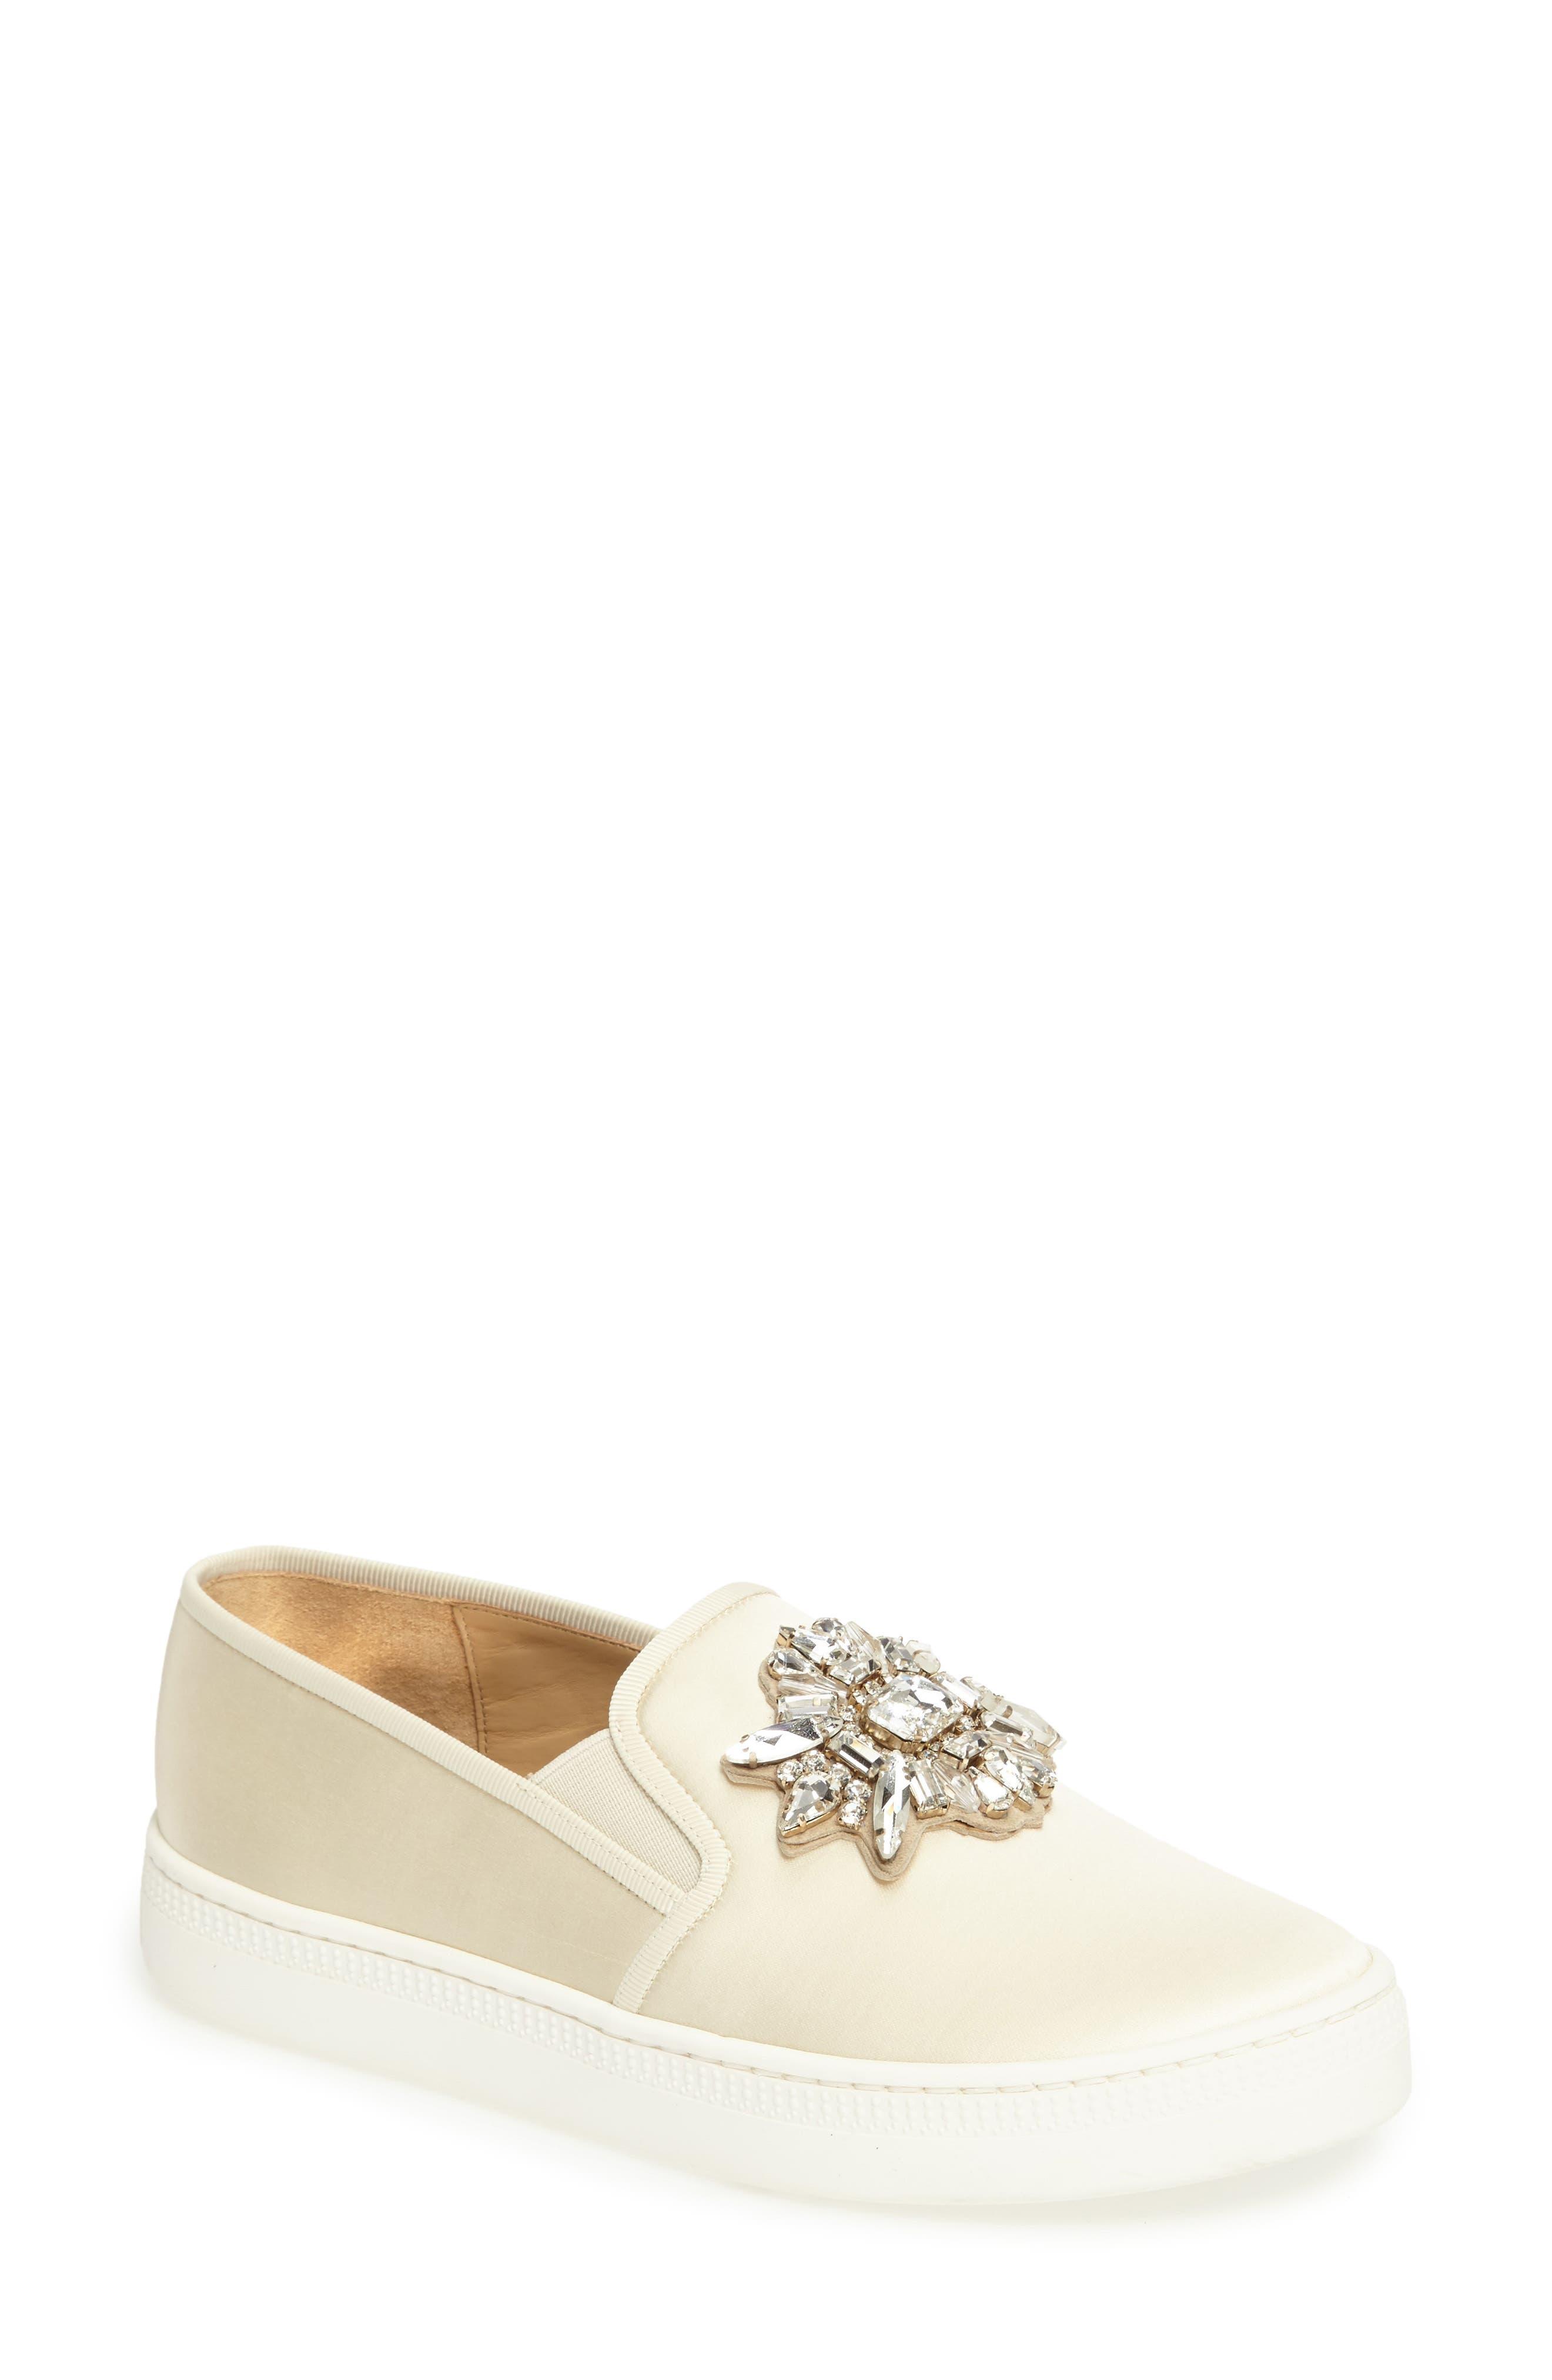 Barre Crystal Embellished Slip-On Sneaker,                             Main thumbnail 1, color,                             Ivory Satin